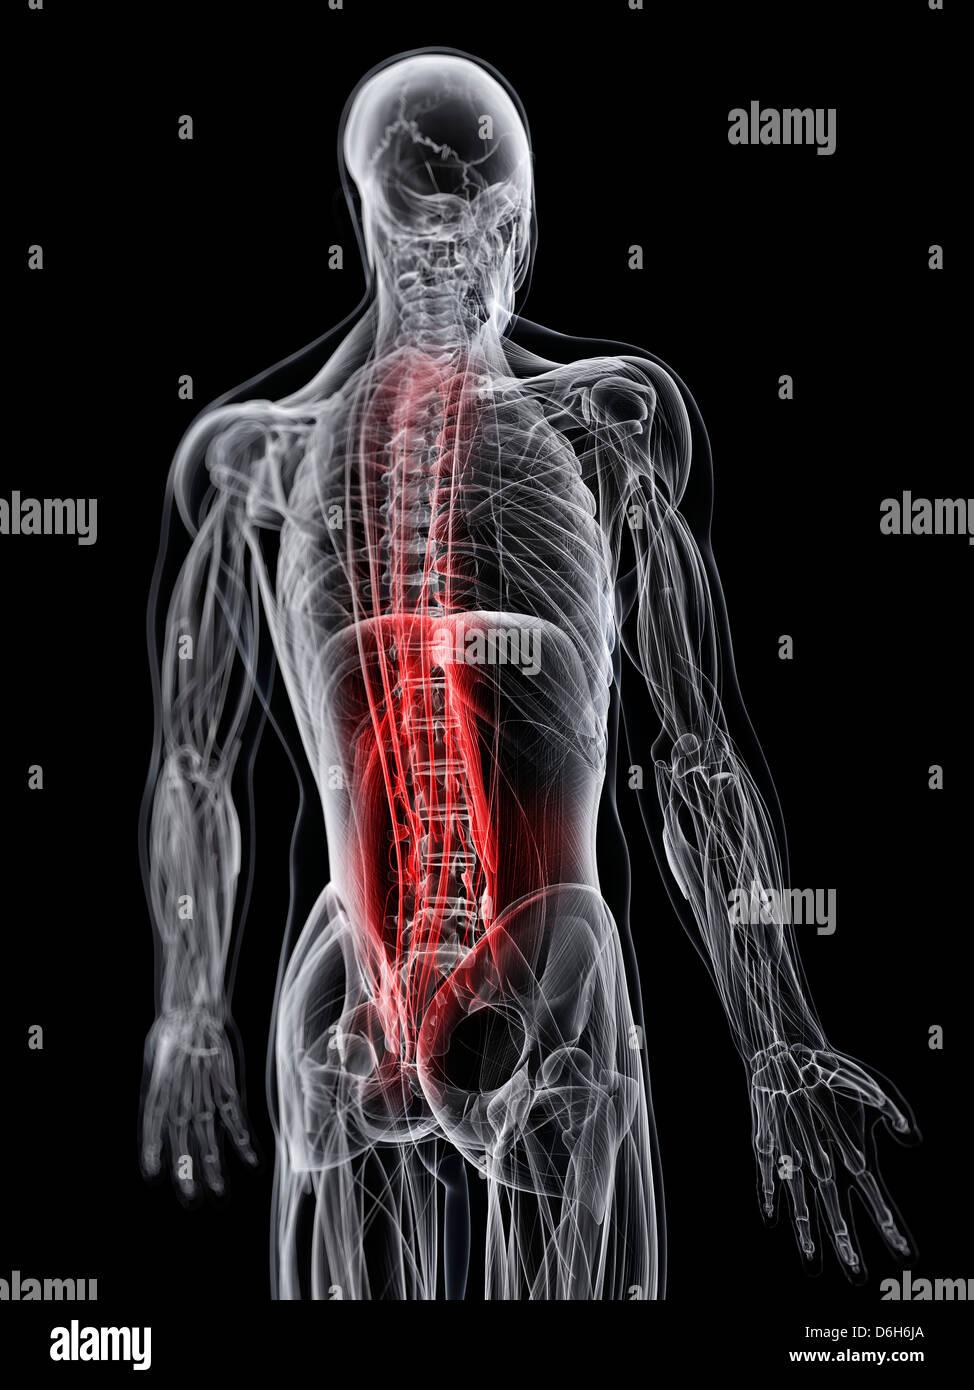 Man Back Pain Anatomy Stock Photos & Man Back Pain Anatomy Stock ...